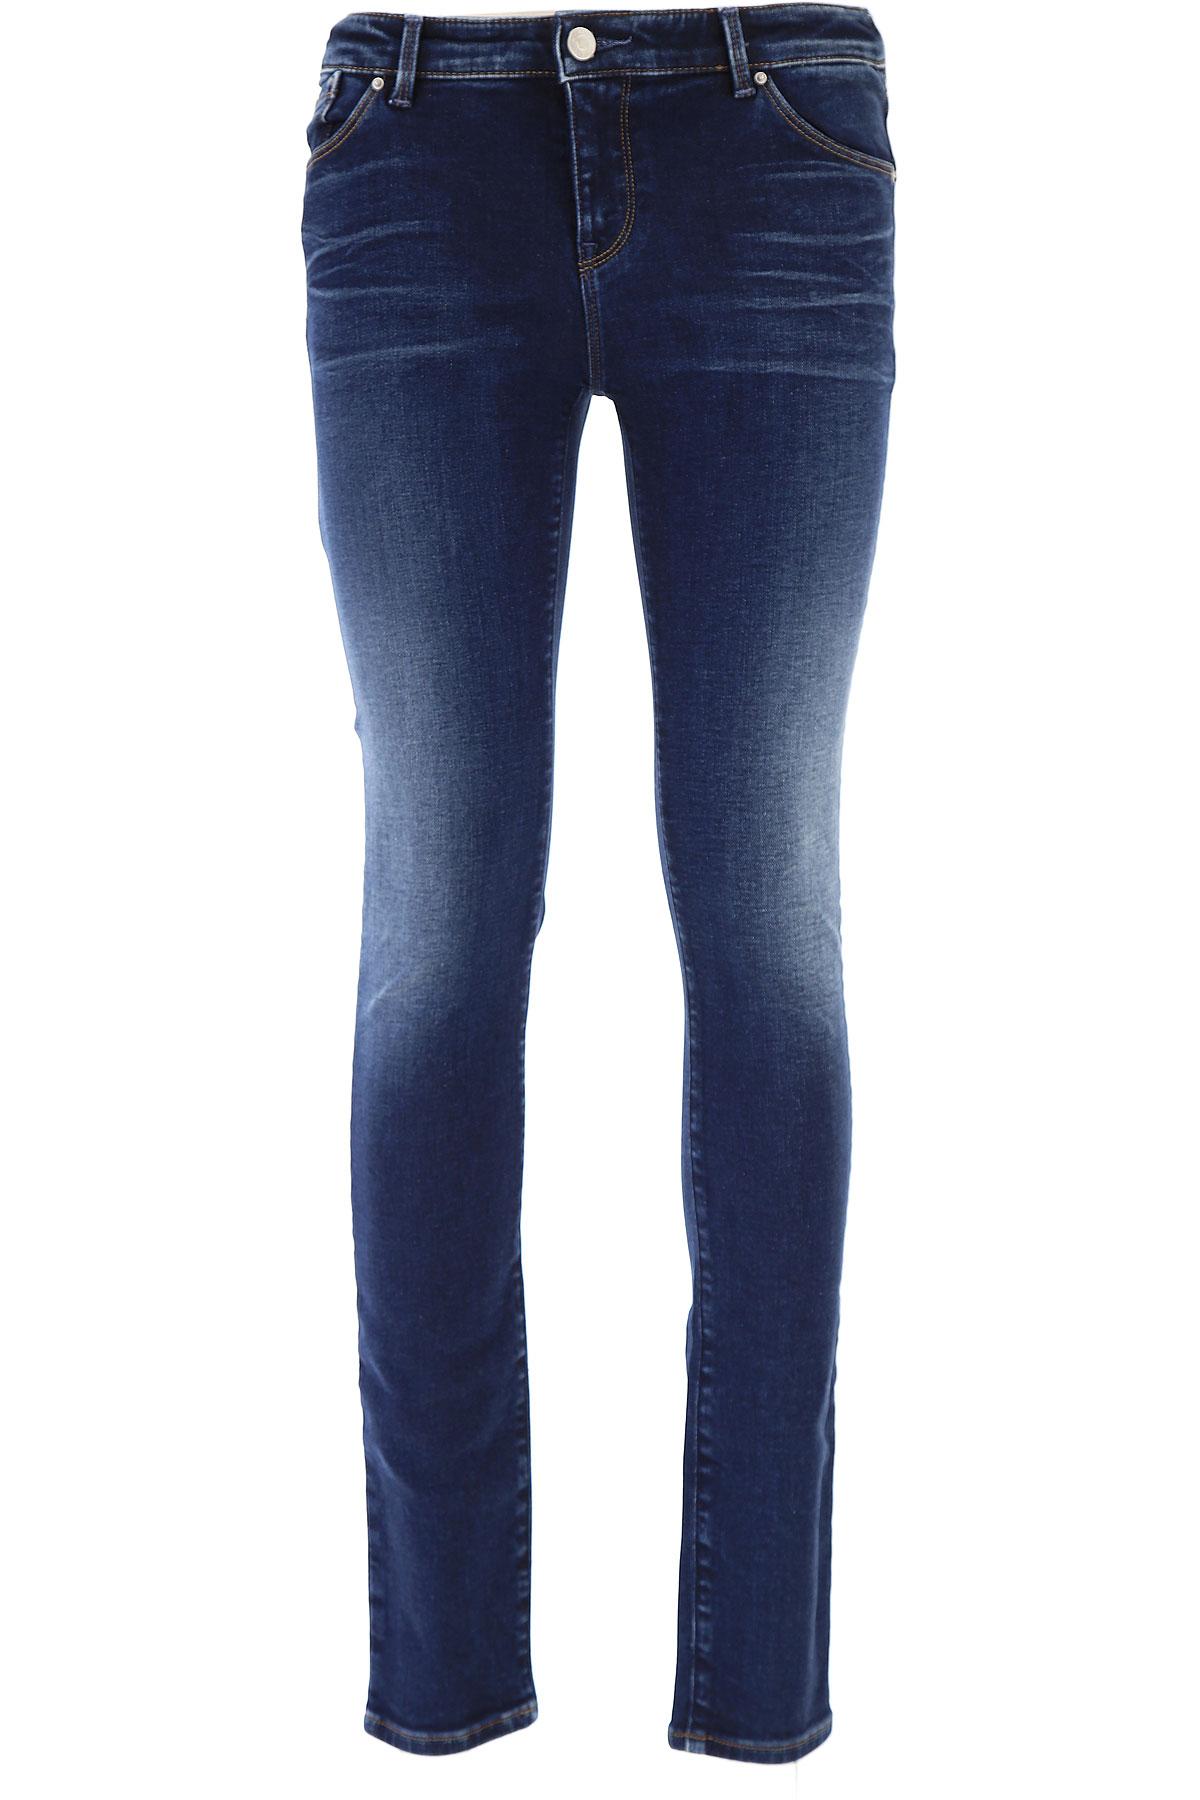 Image of Giorgio Armani Jeans On Sale, Denim, Cotton, 2017, 26 27 28 29 30 31 33